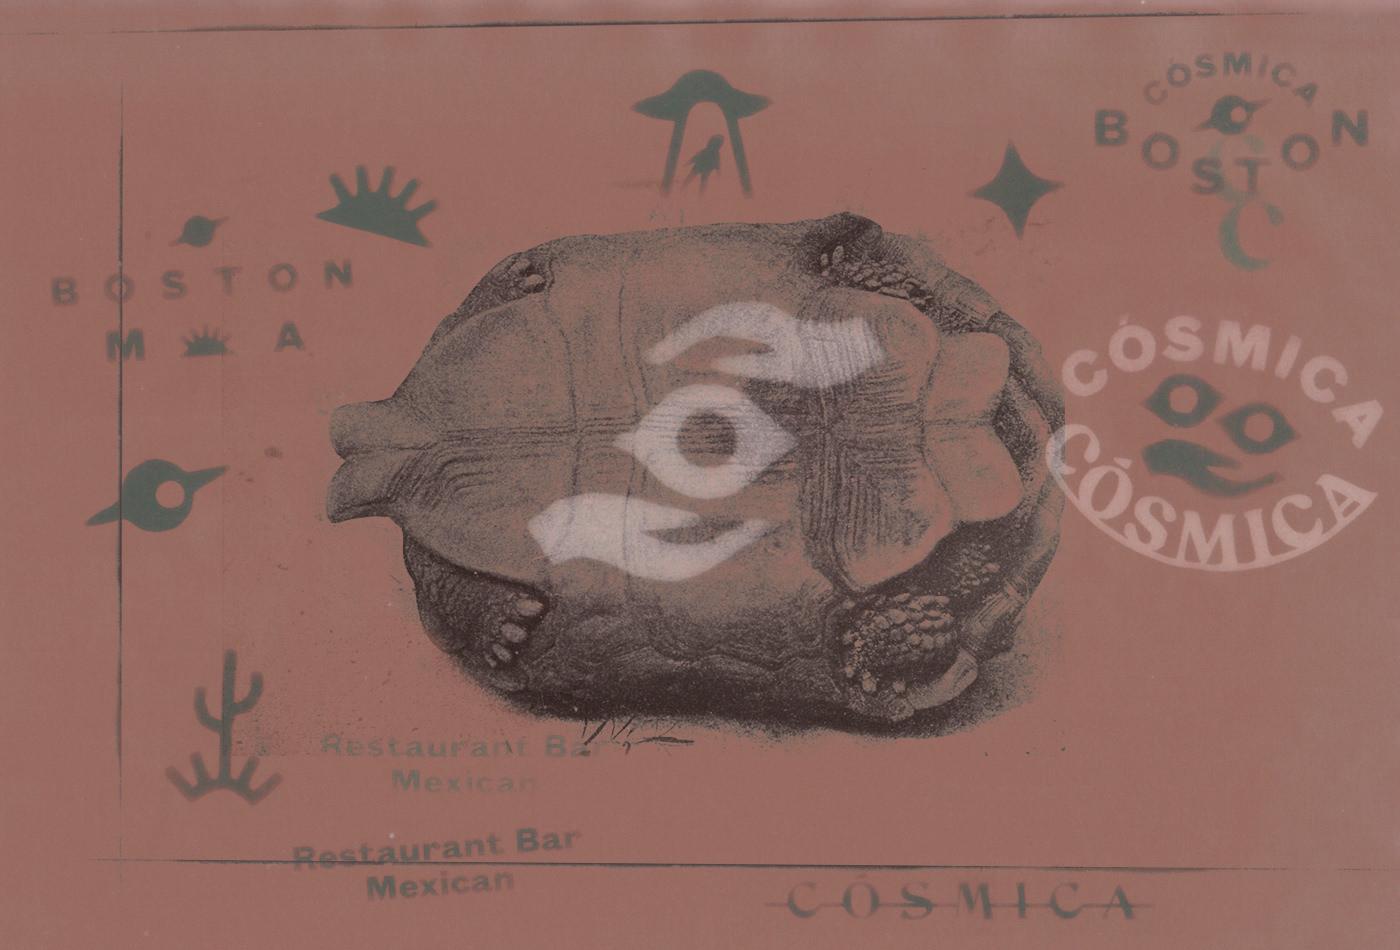 cosmica-cosmicaboston-cactus-boston-thebeehive-jackbardy-vacaliebres-branding-mexican-mexico-taco-tacos-cla-mex-logo-branding-pictos-visual